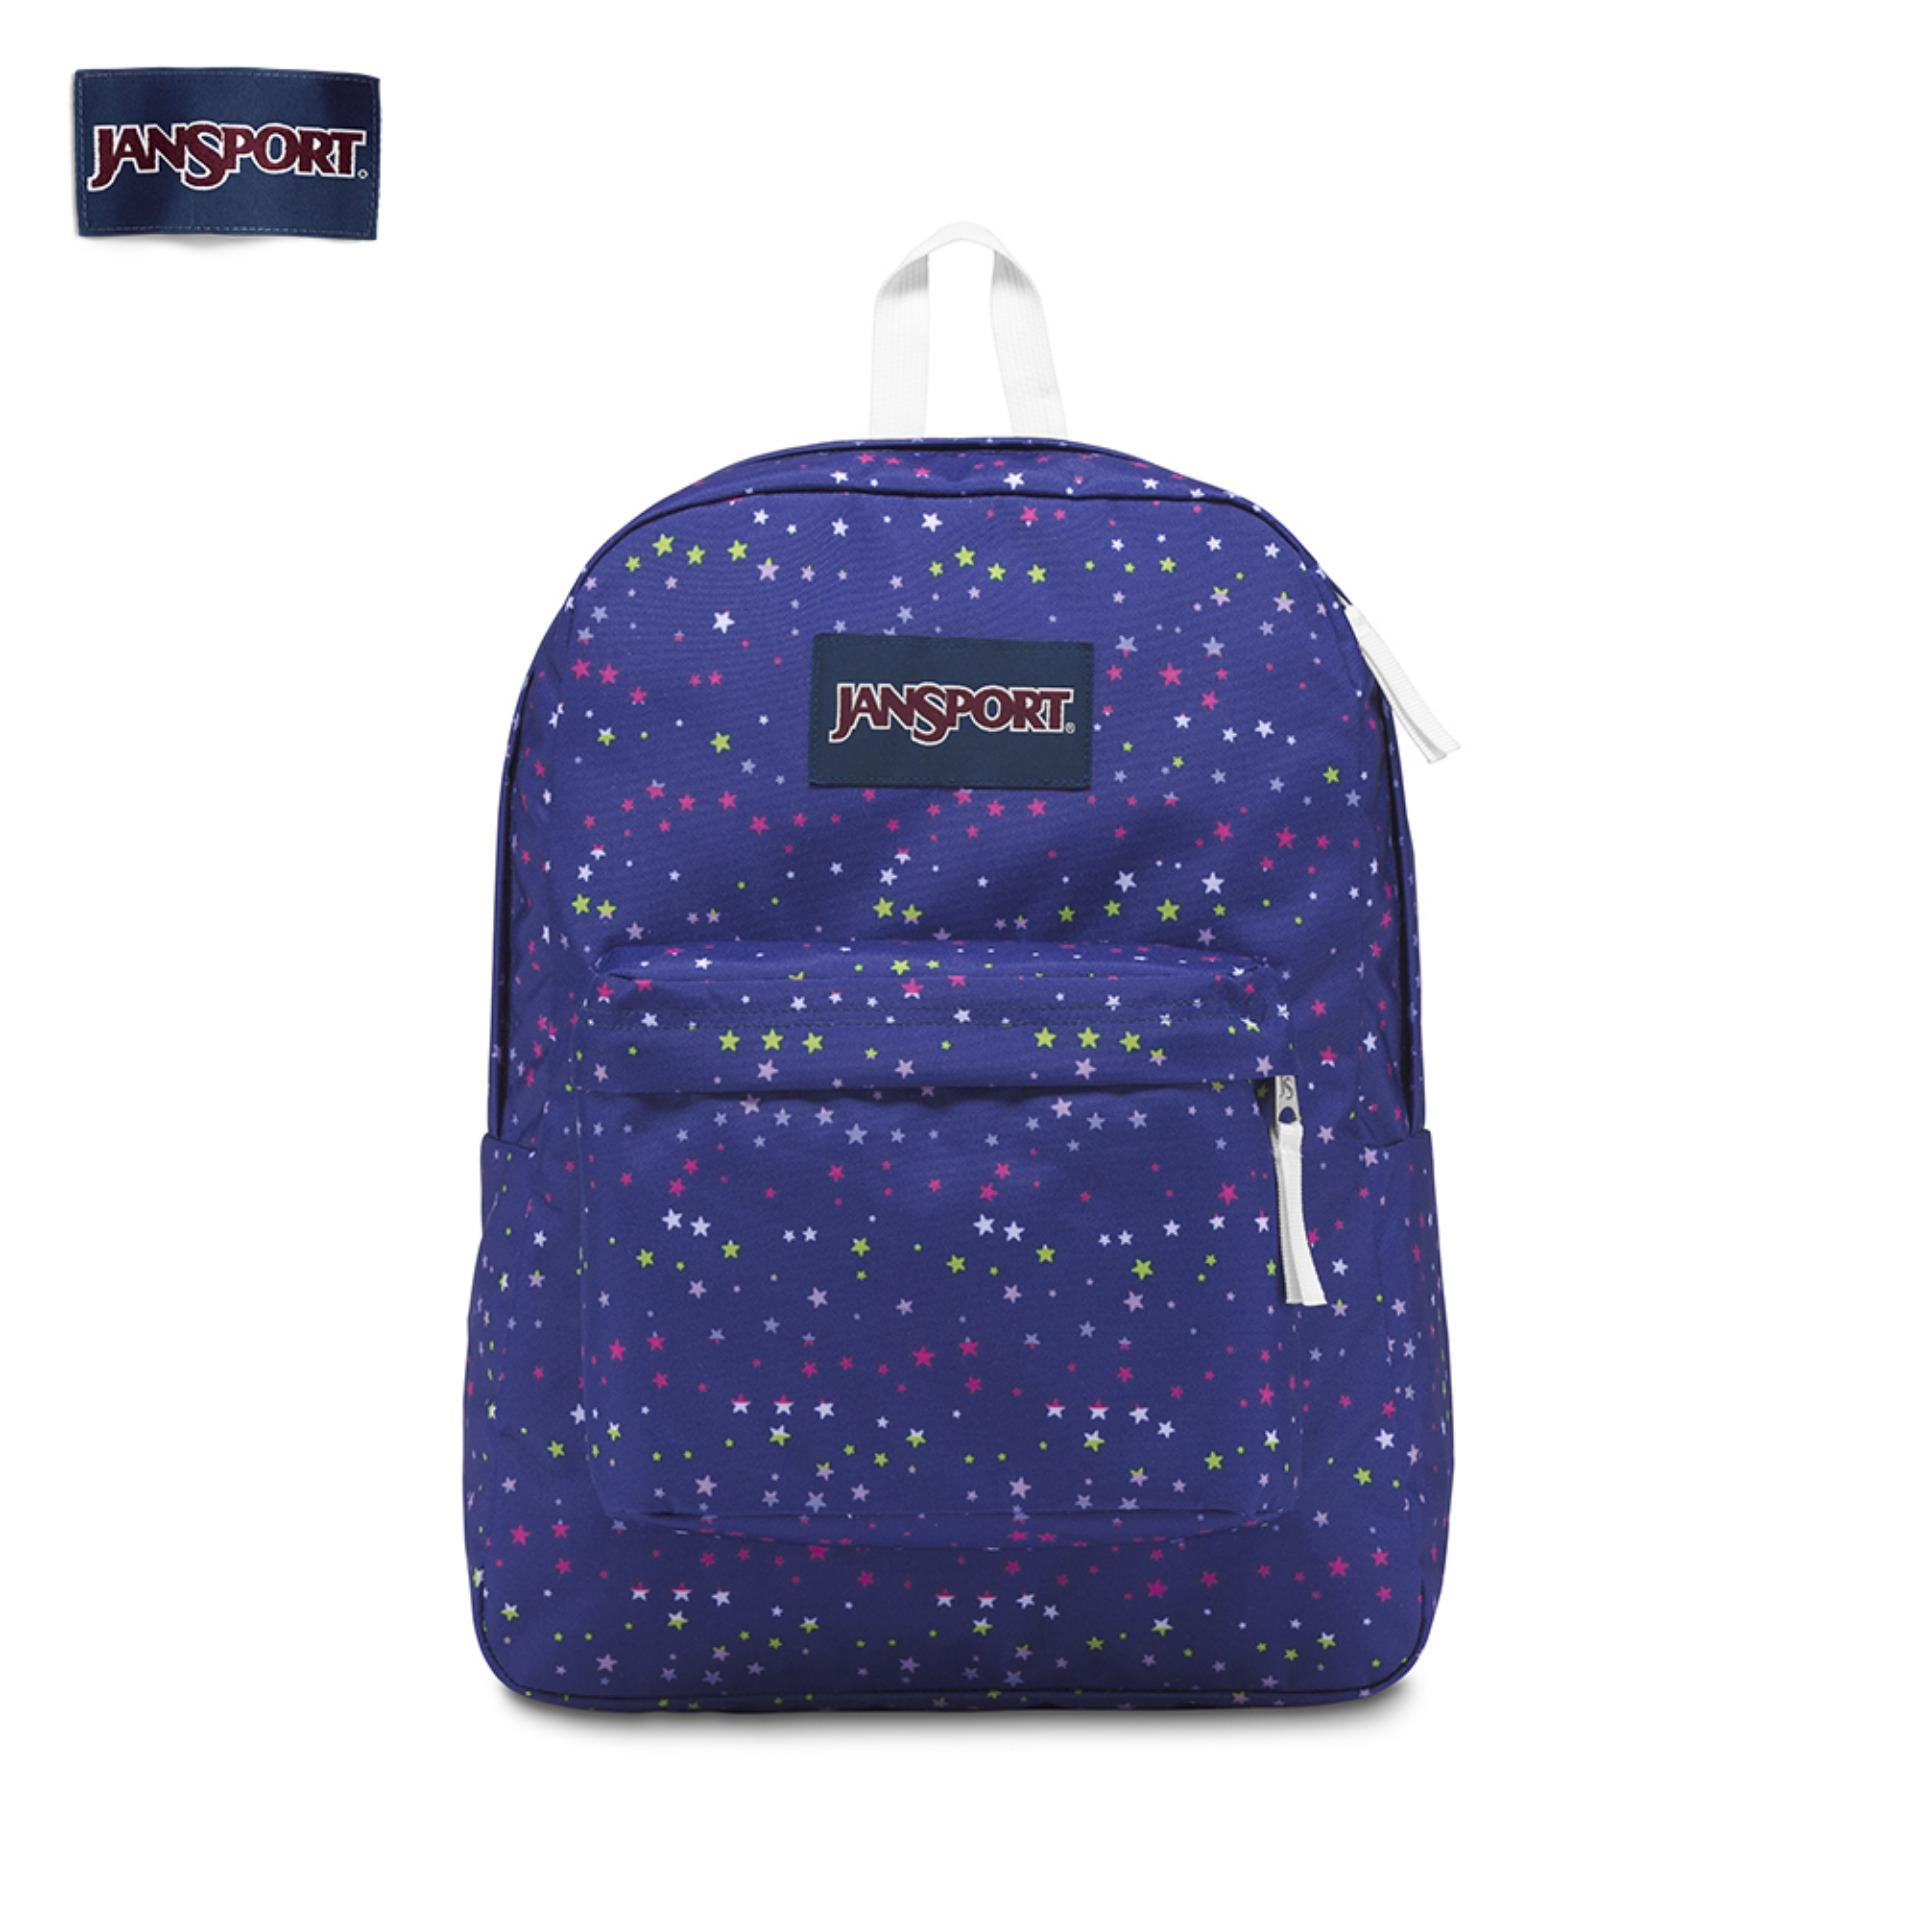 3c49a8a795 JanSport Philippines  JanSport price list - JanSport Bags ...